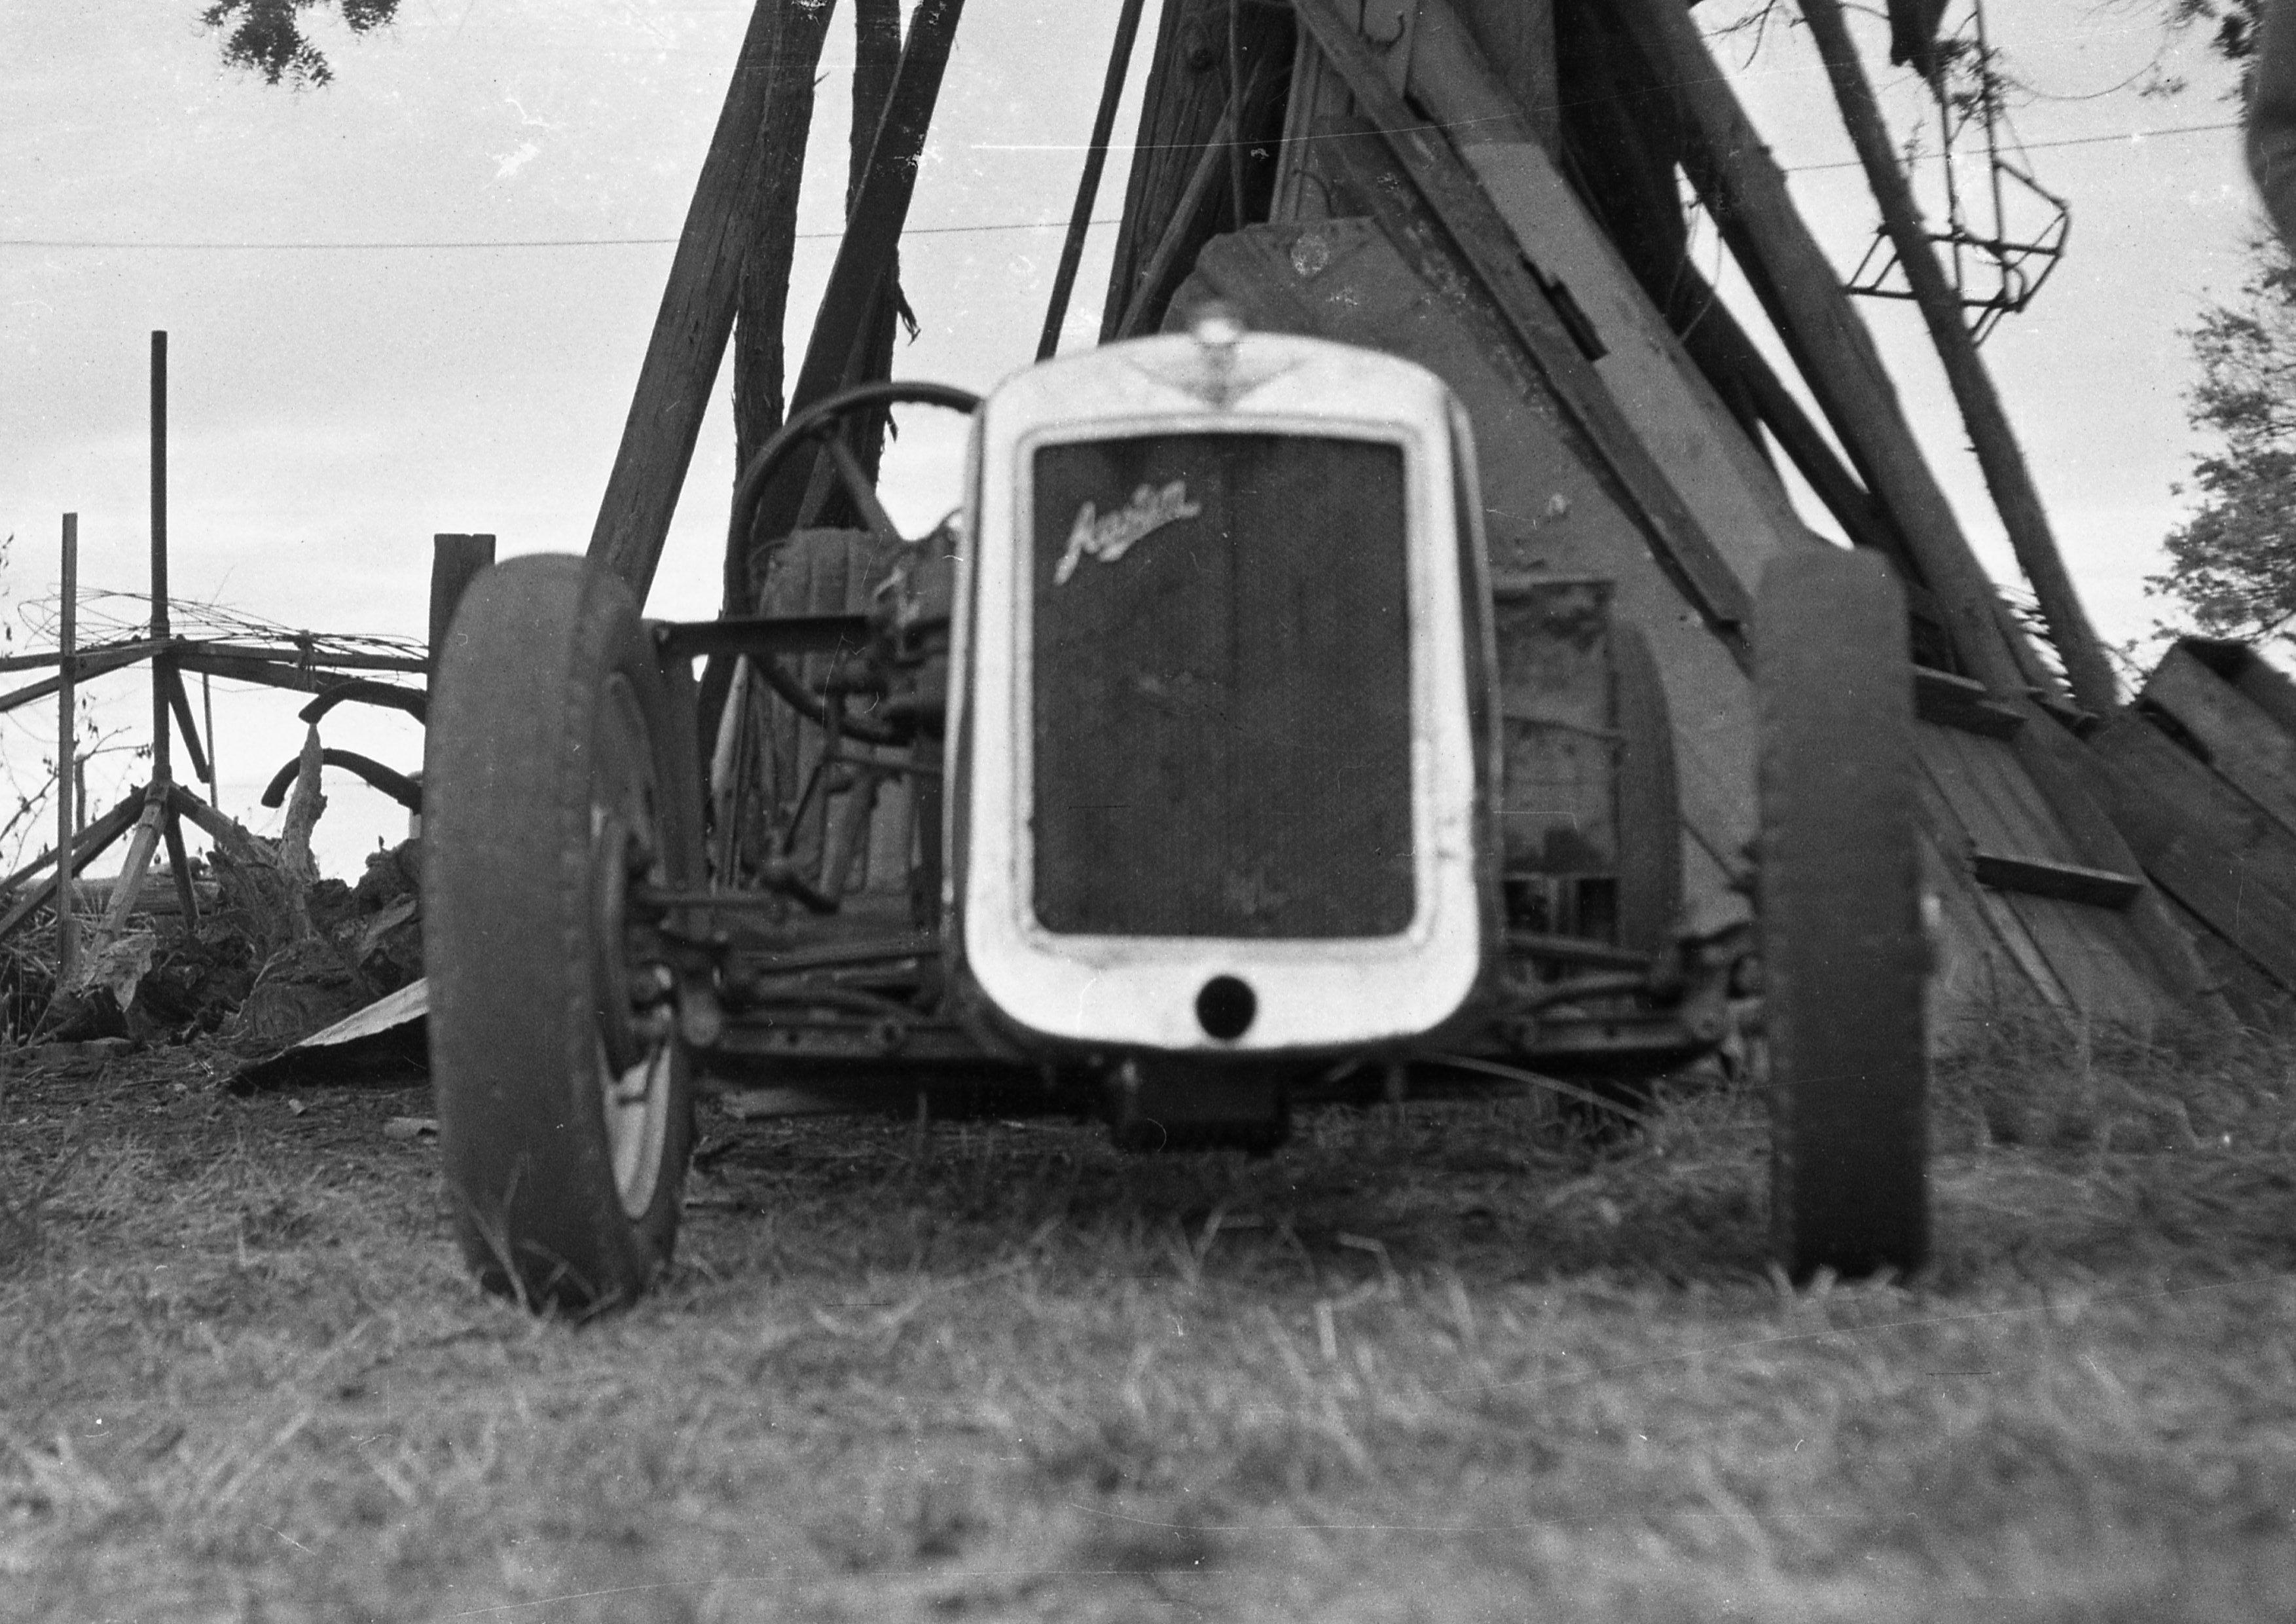 1960Austin 7